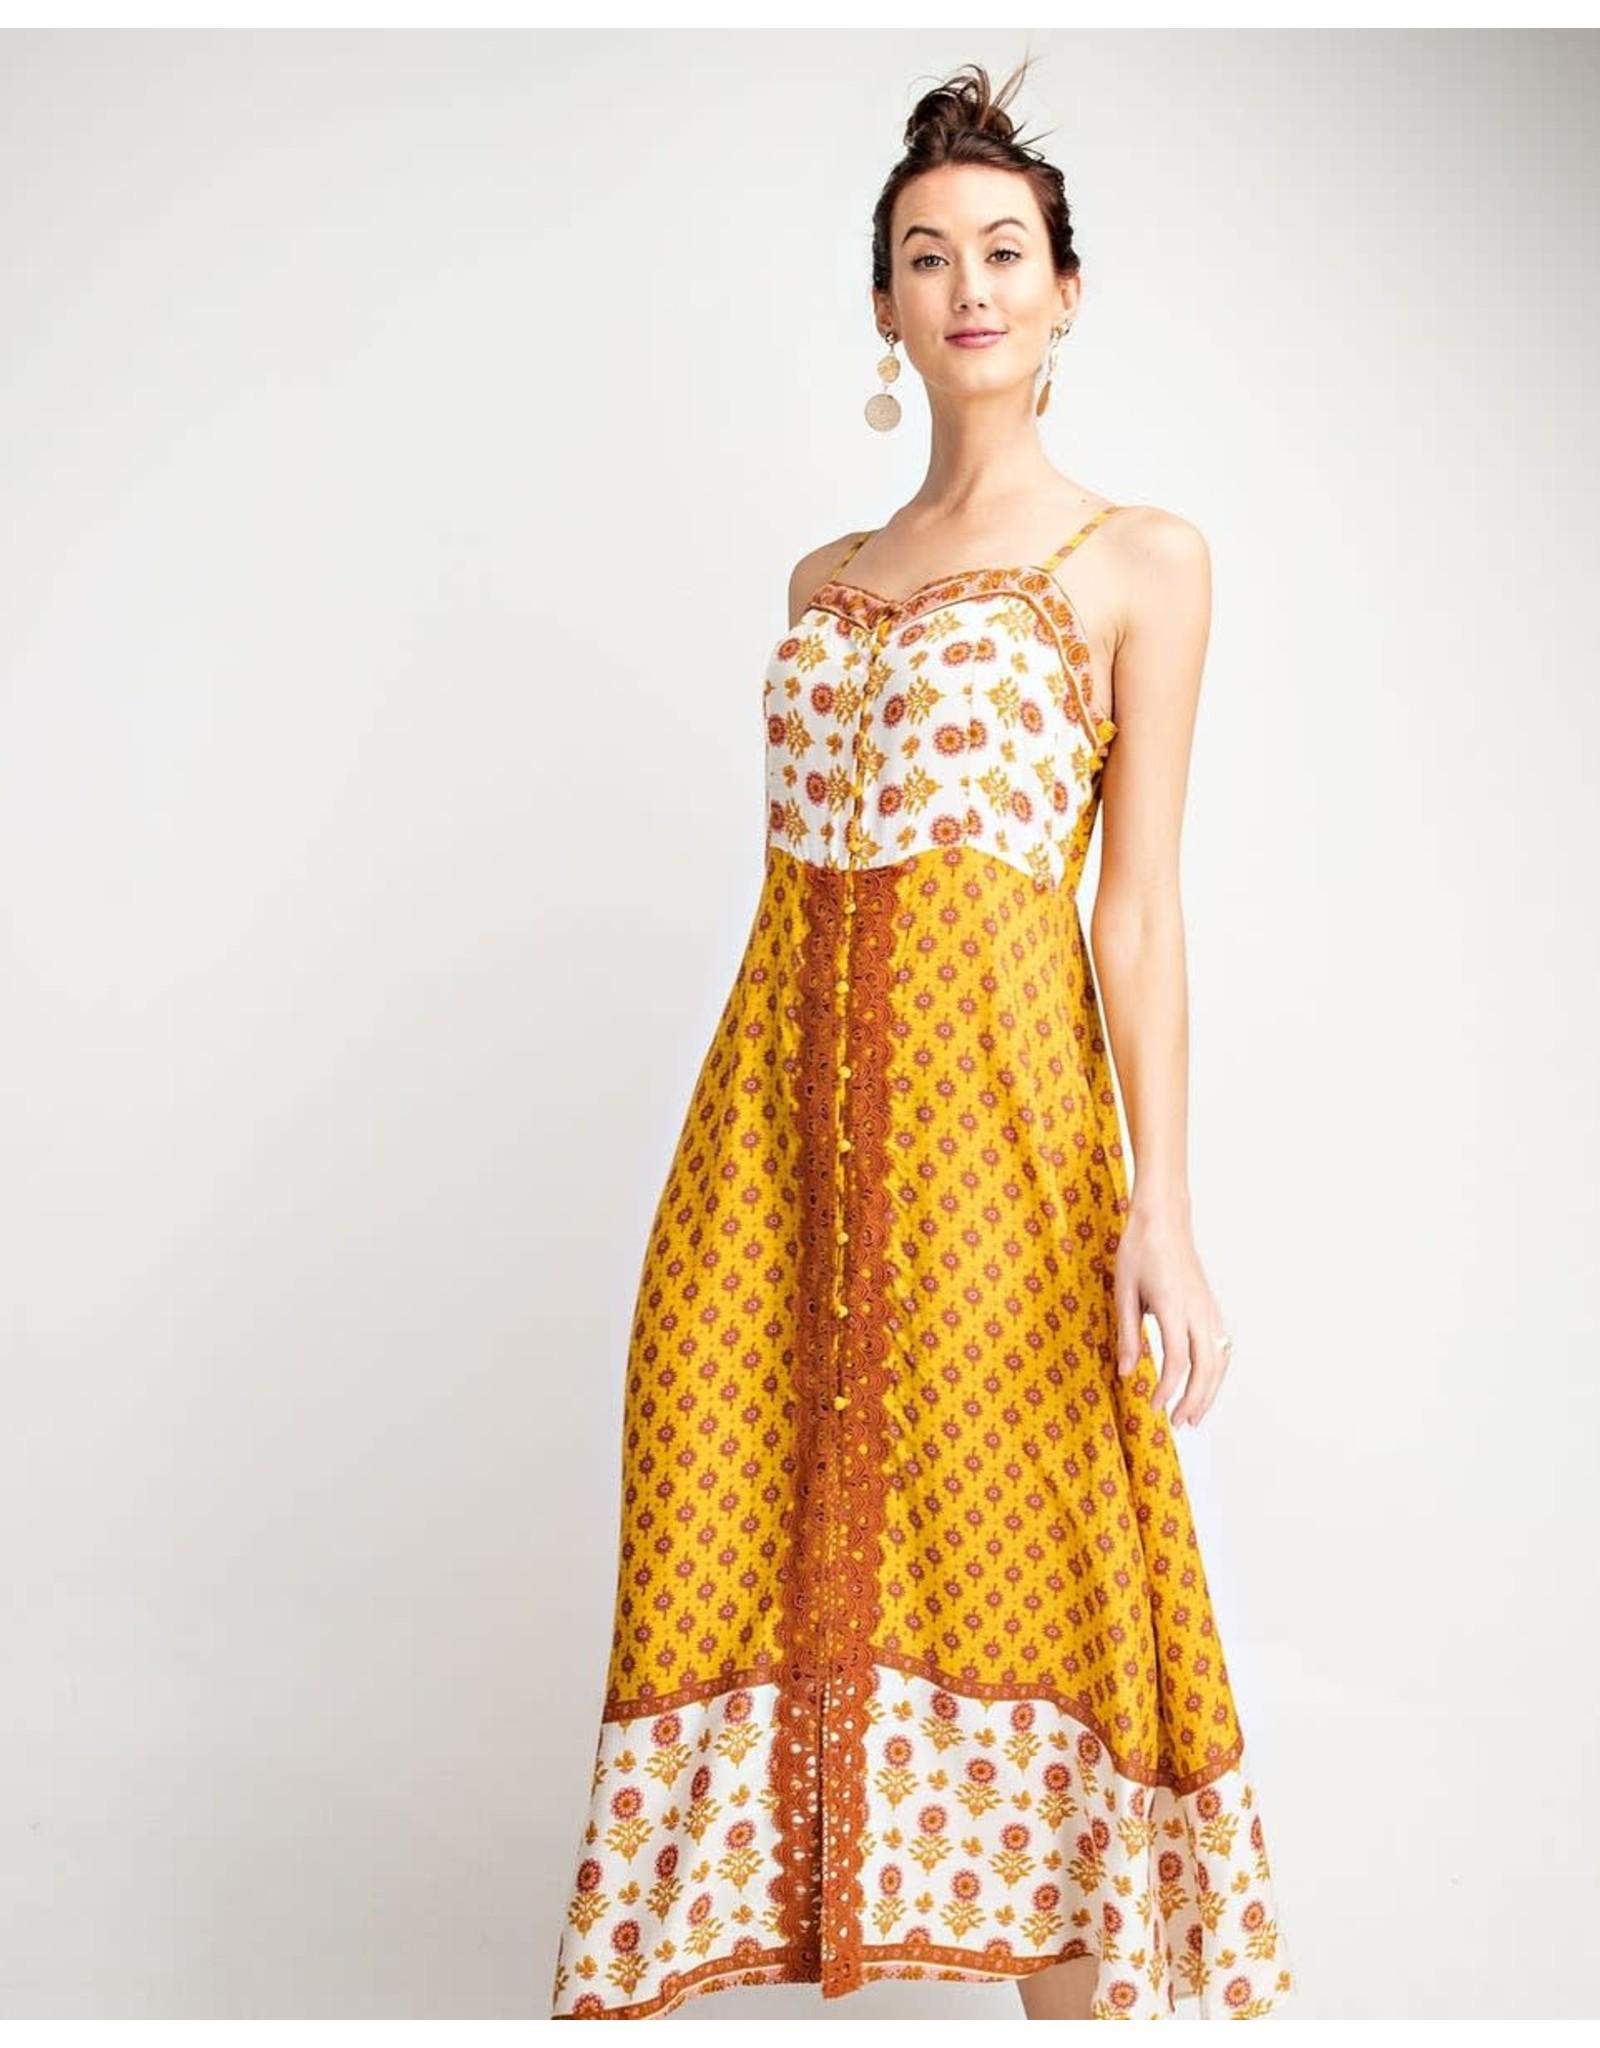 Easel Boho Floral Print Button Maxi Dress - Mustard